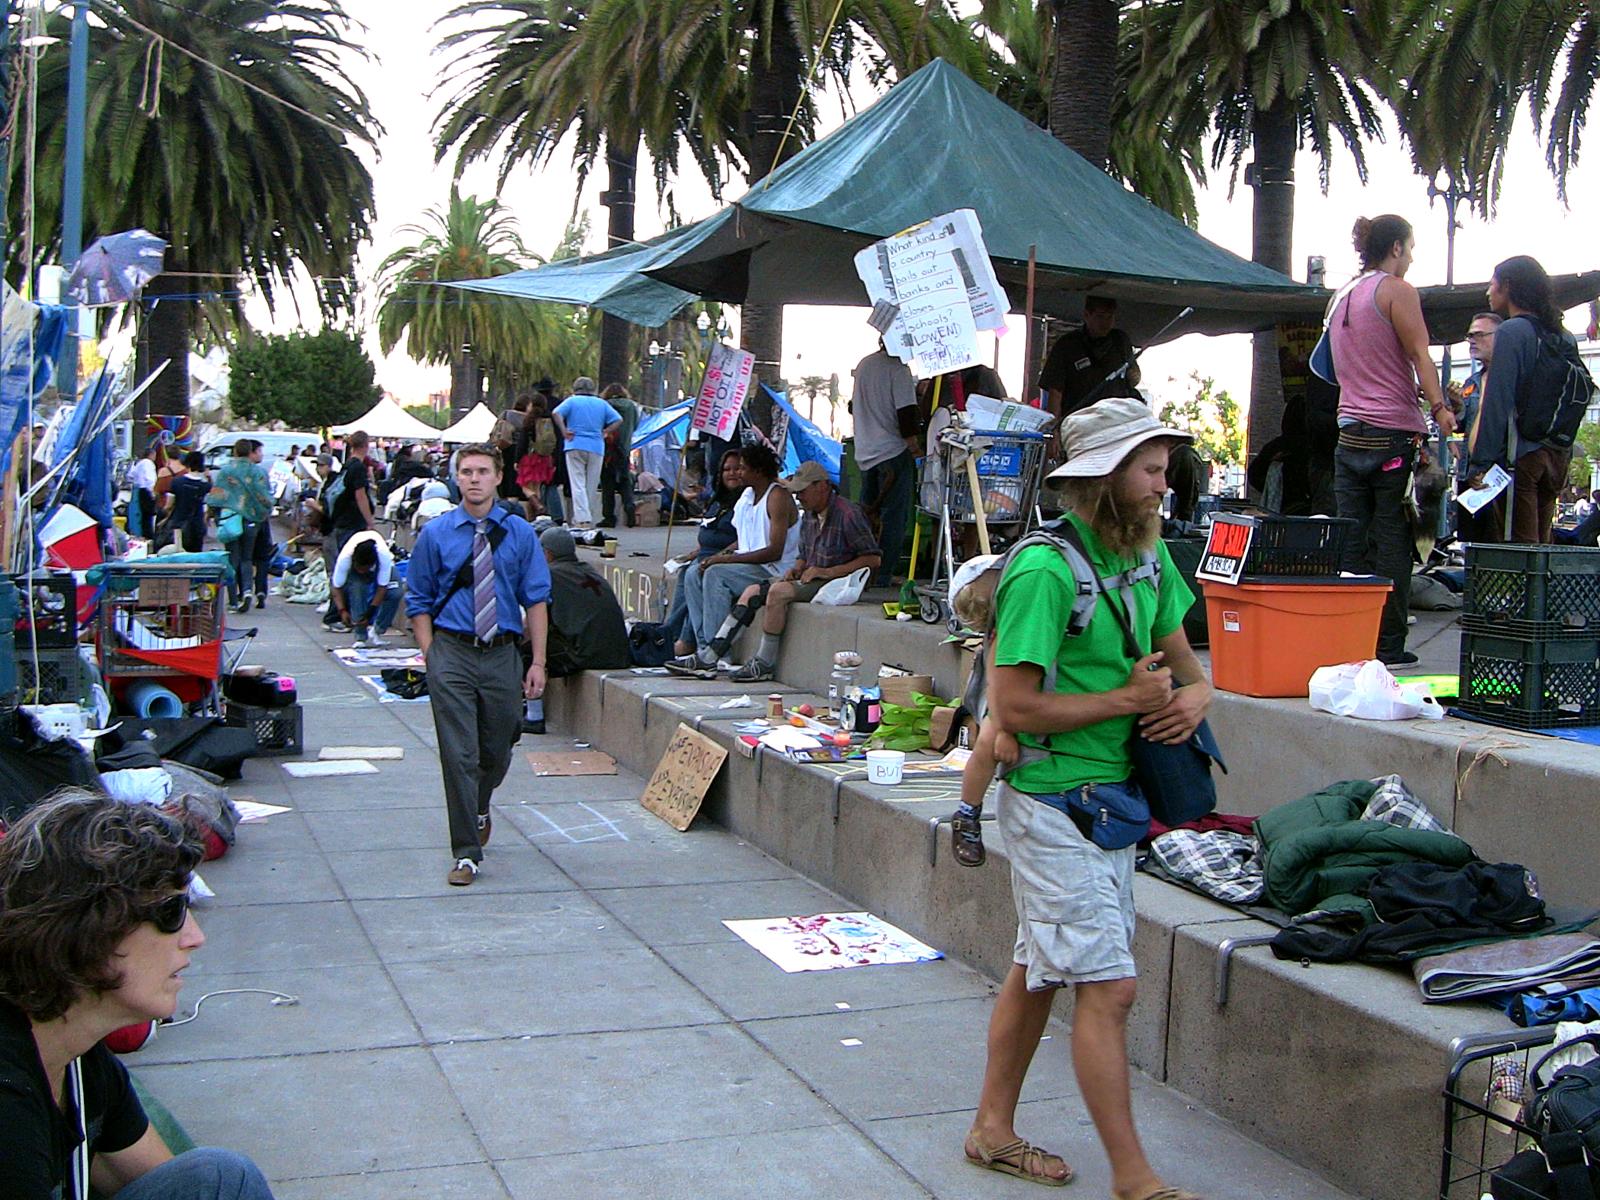 The OccupySF encampment at Justin Herman Plaza is a virtual mini-city. Photo by John C. Osborn